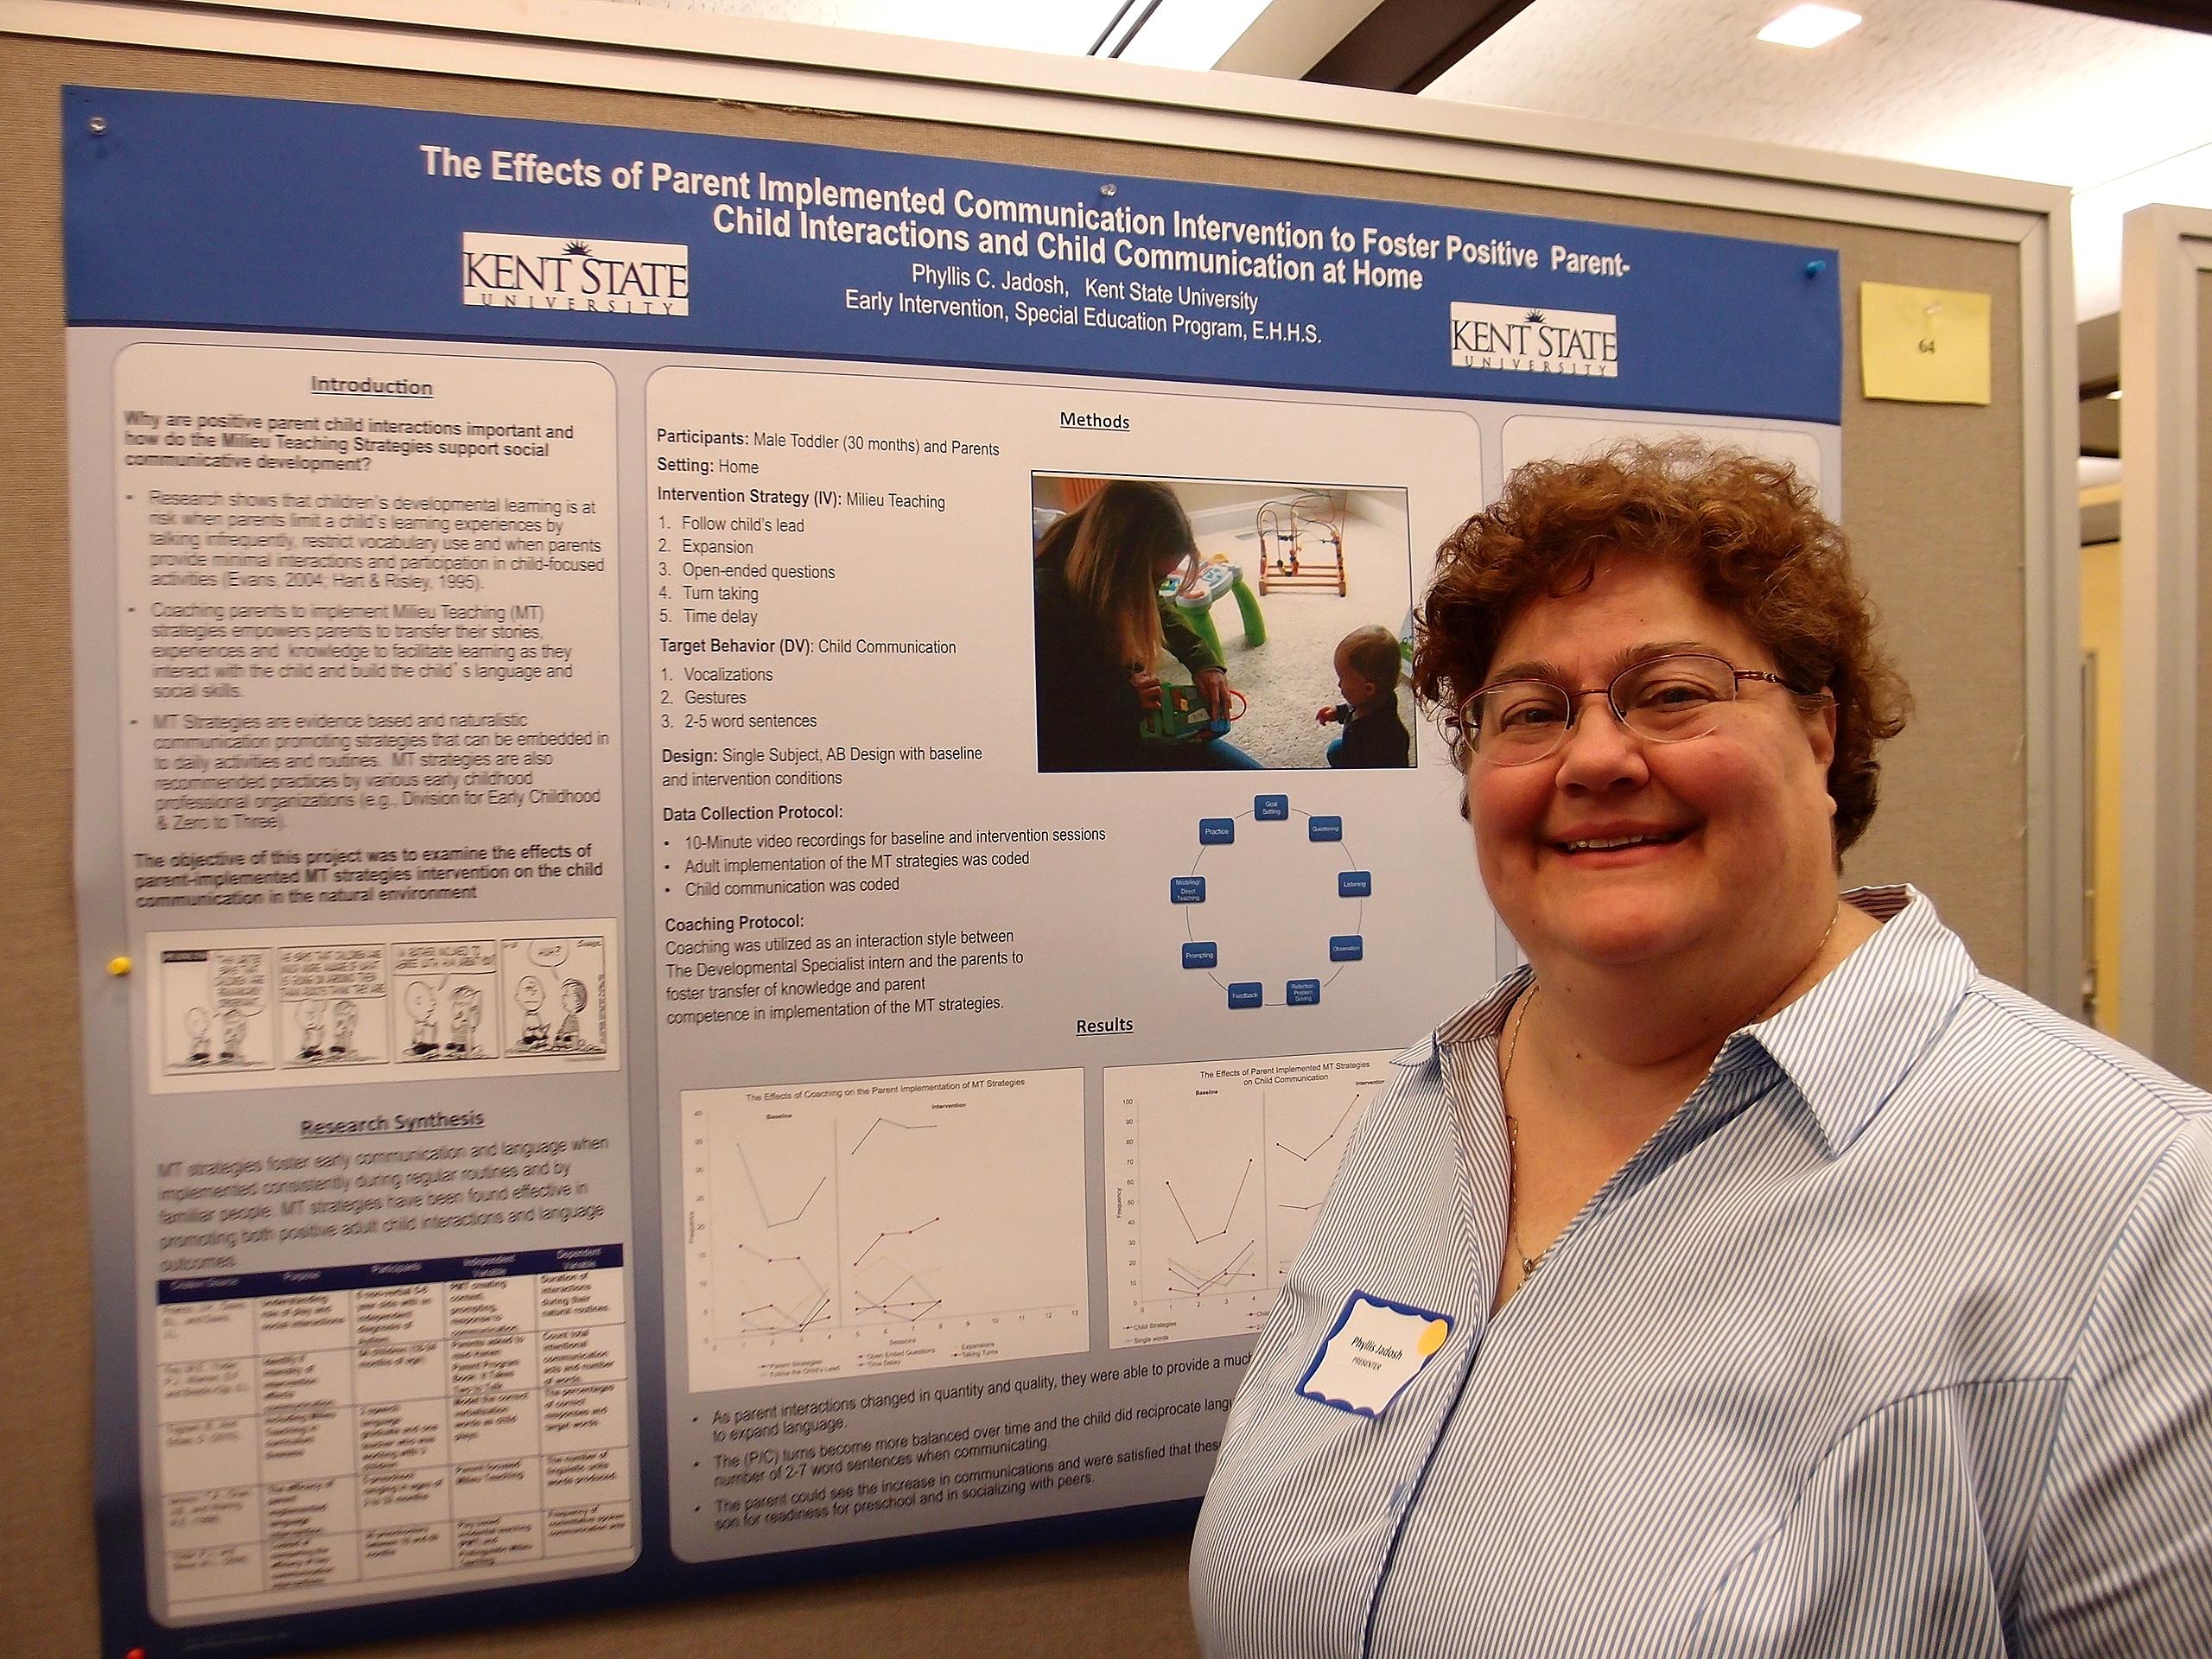 Research Symposium 2015 - Phyllis